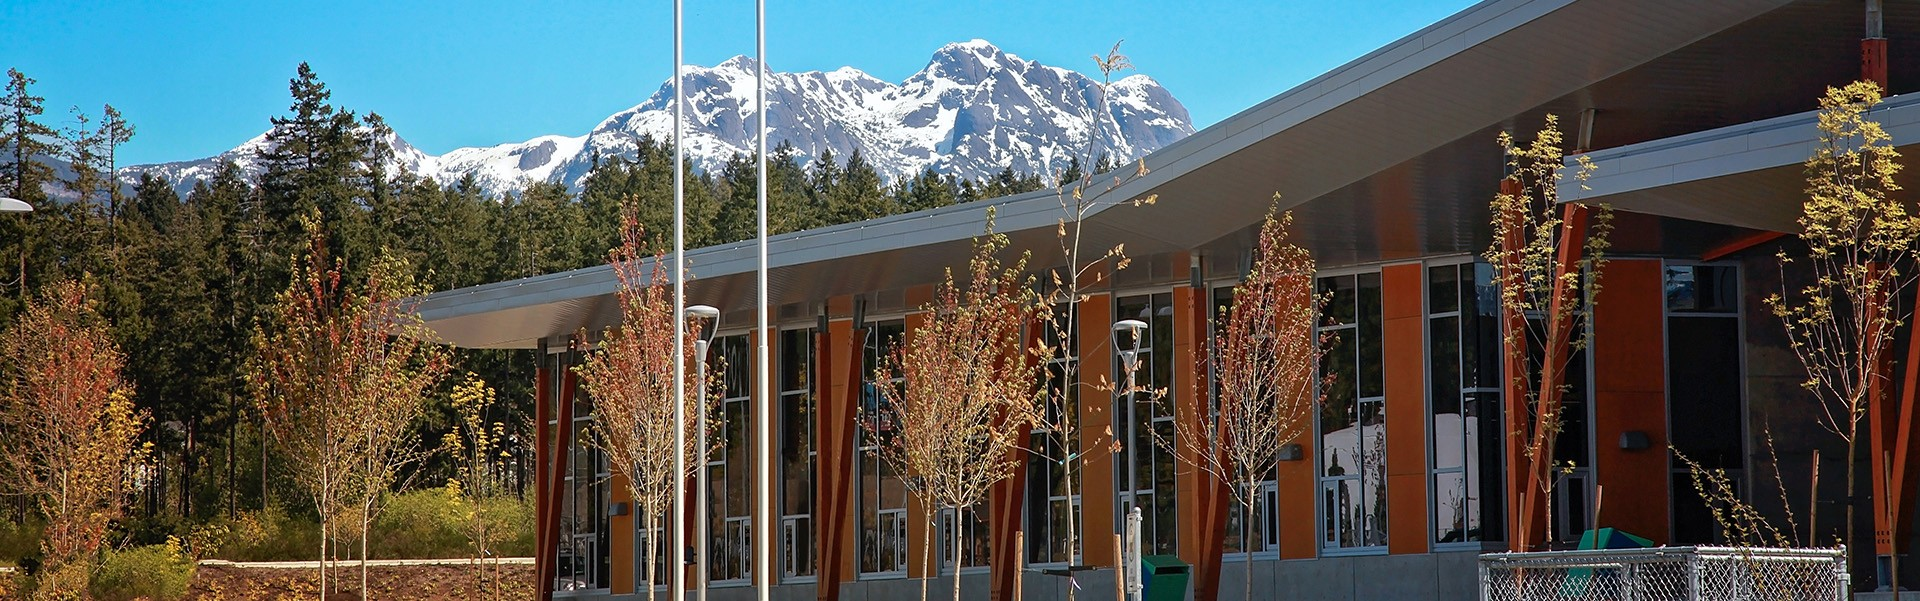 Educatius-AlberniHighSchool-Canada-Front-of-HighSchool-Banner-2019